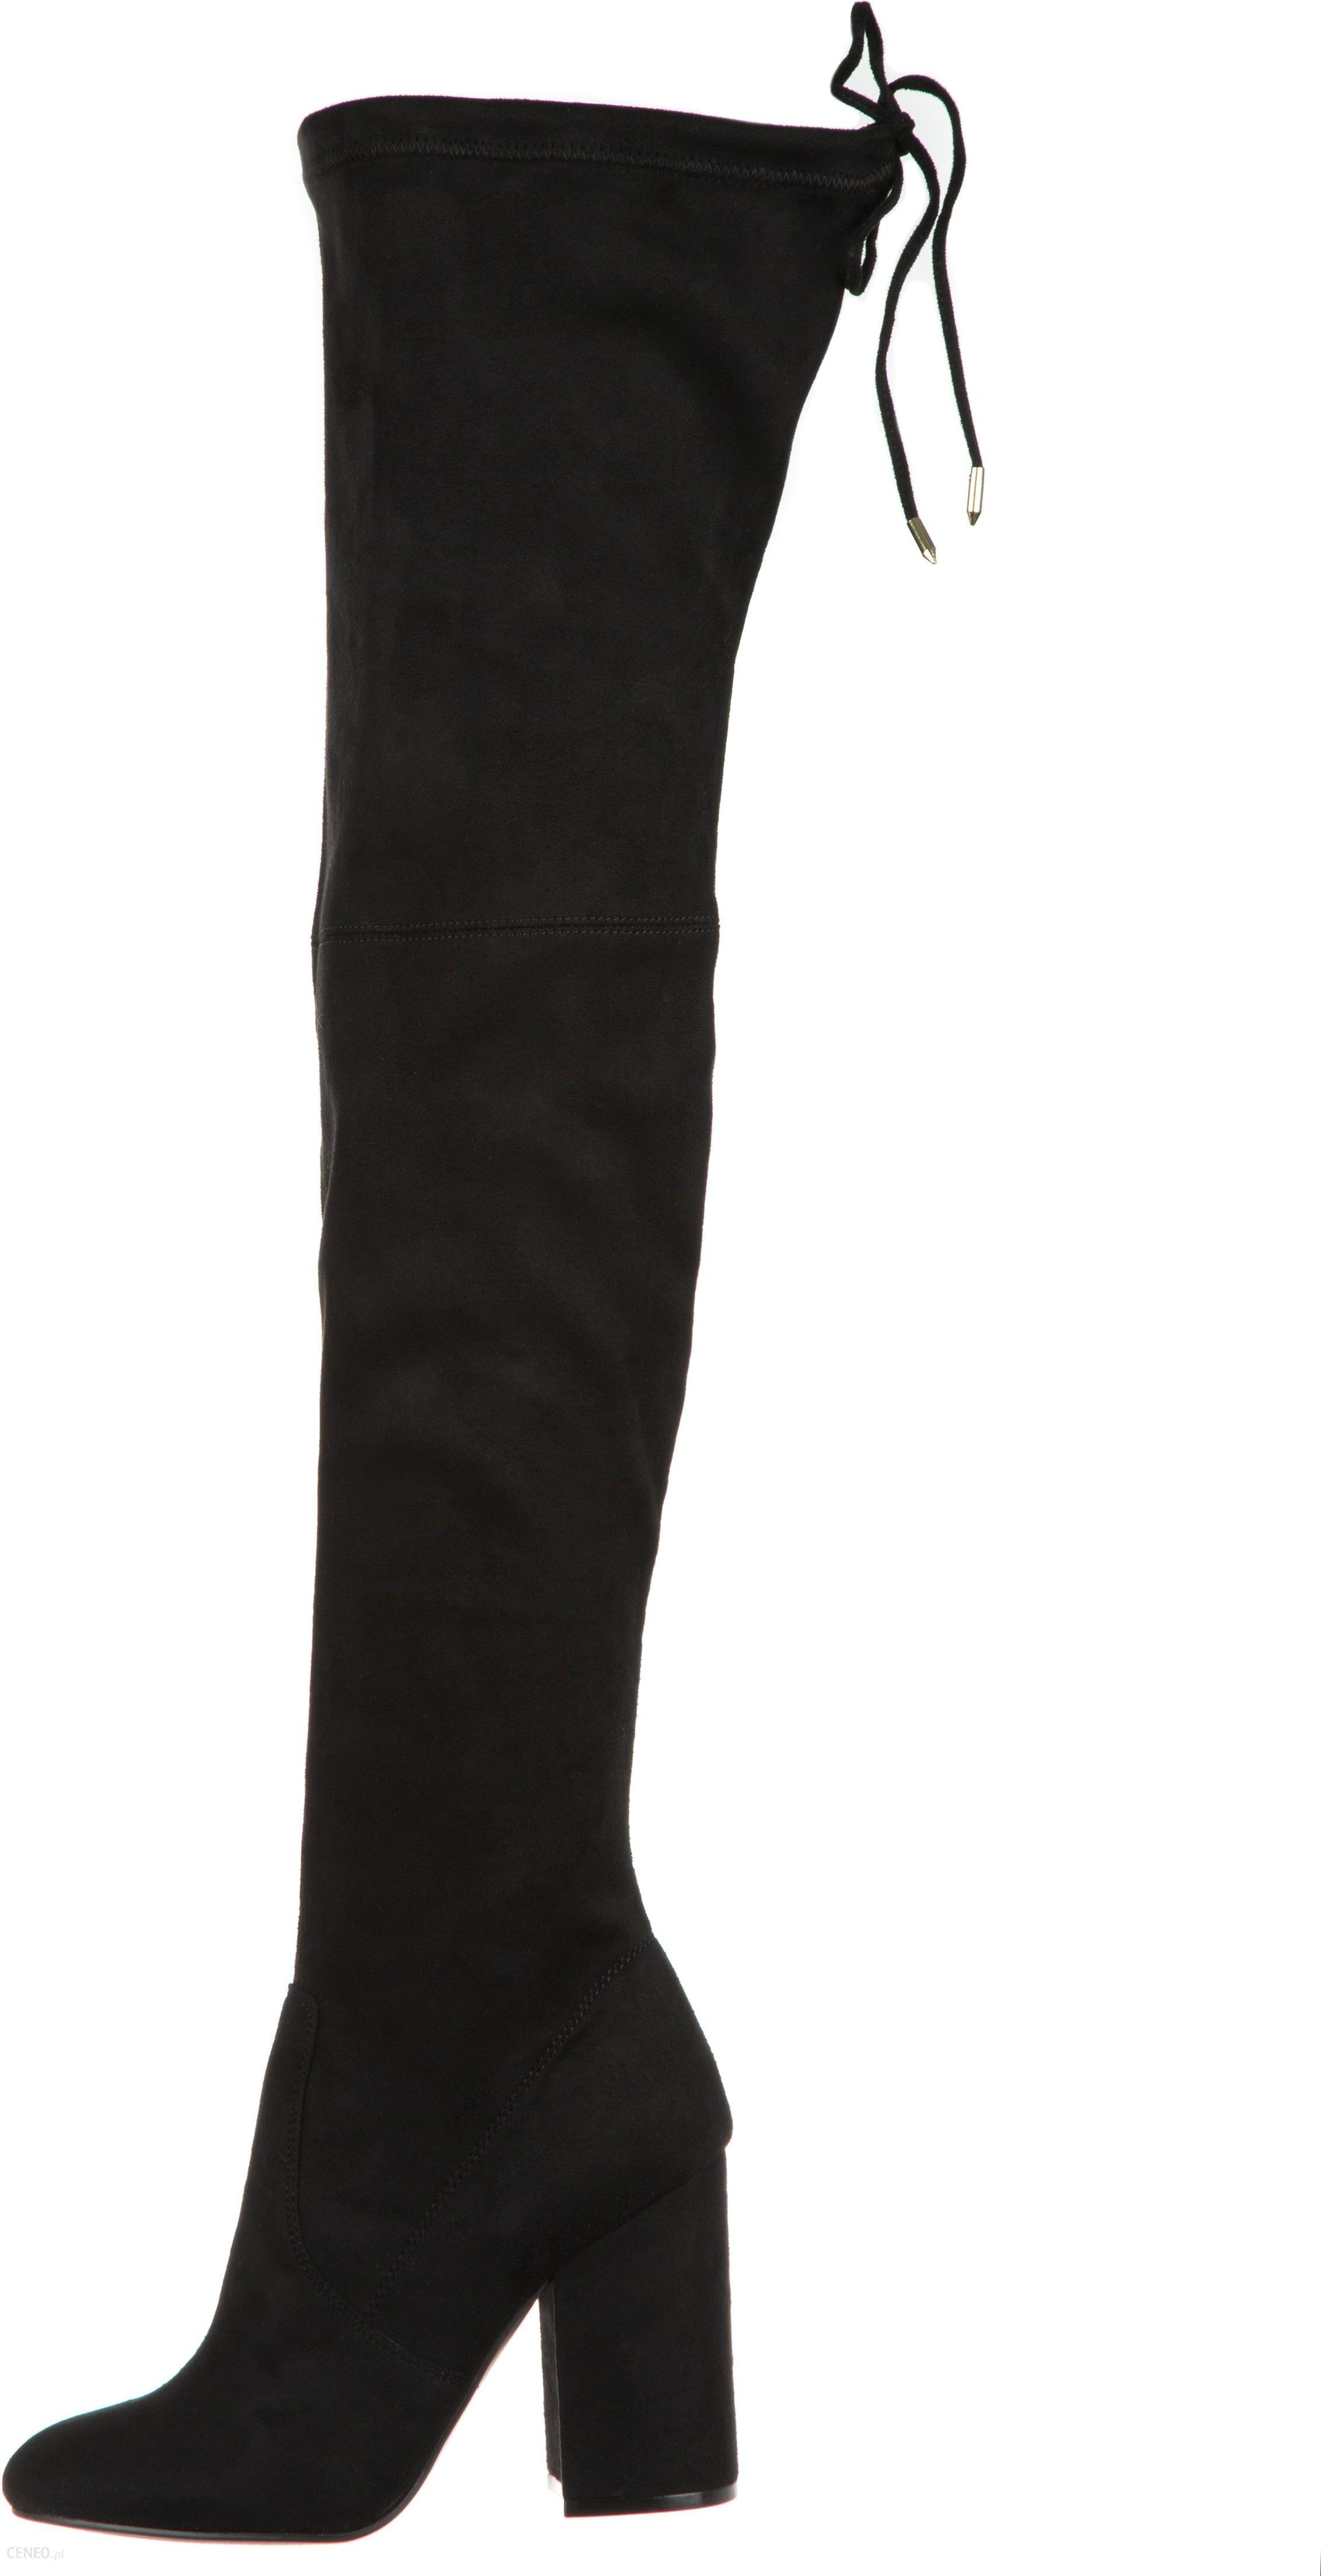 07deadd604c Steve Madden Norri Tall boots Czarny 41 - Ceny i opinie - Ceneo.pl